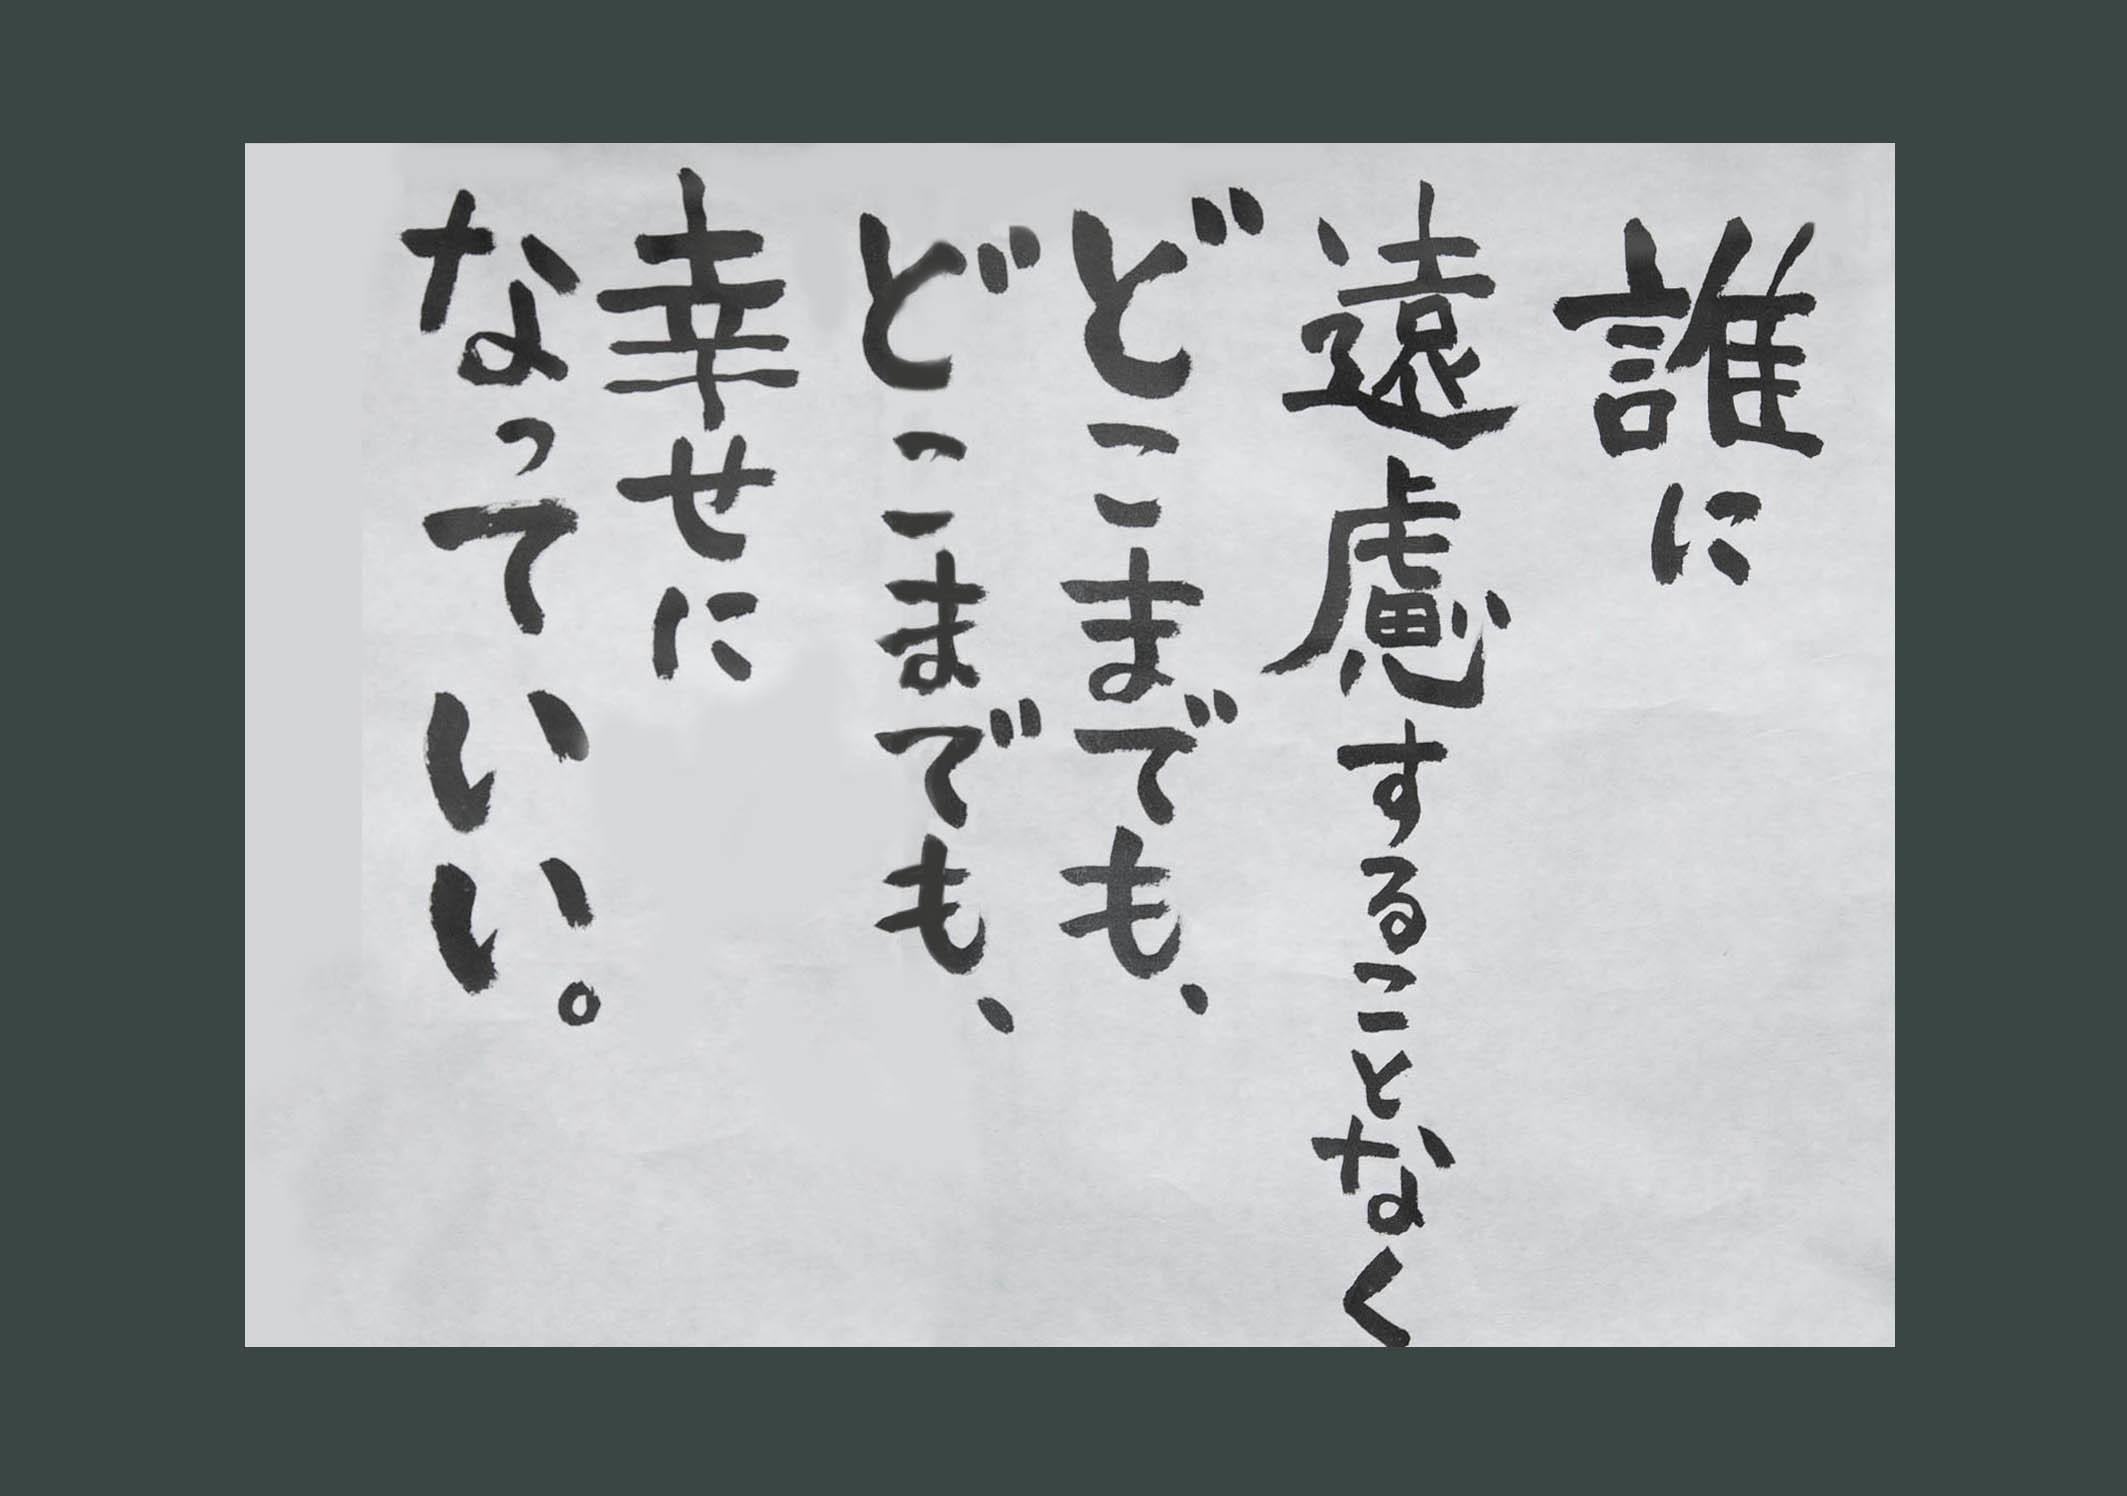 5月15日 快晴の土曜日_f0077849_18091850.jpg